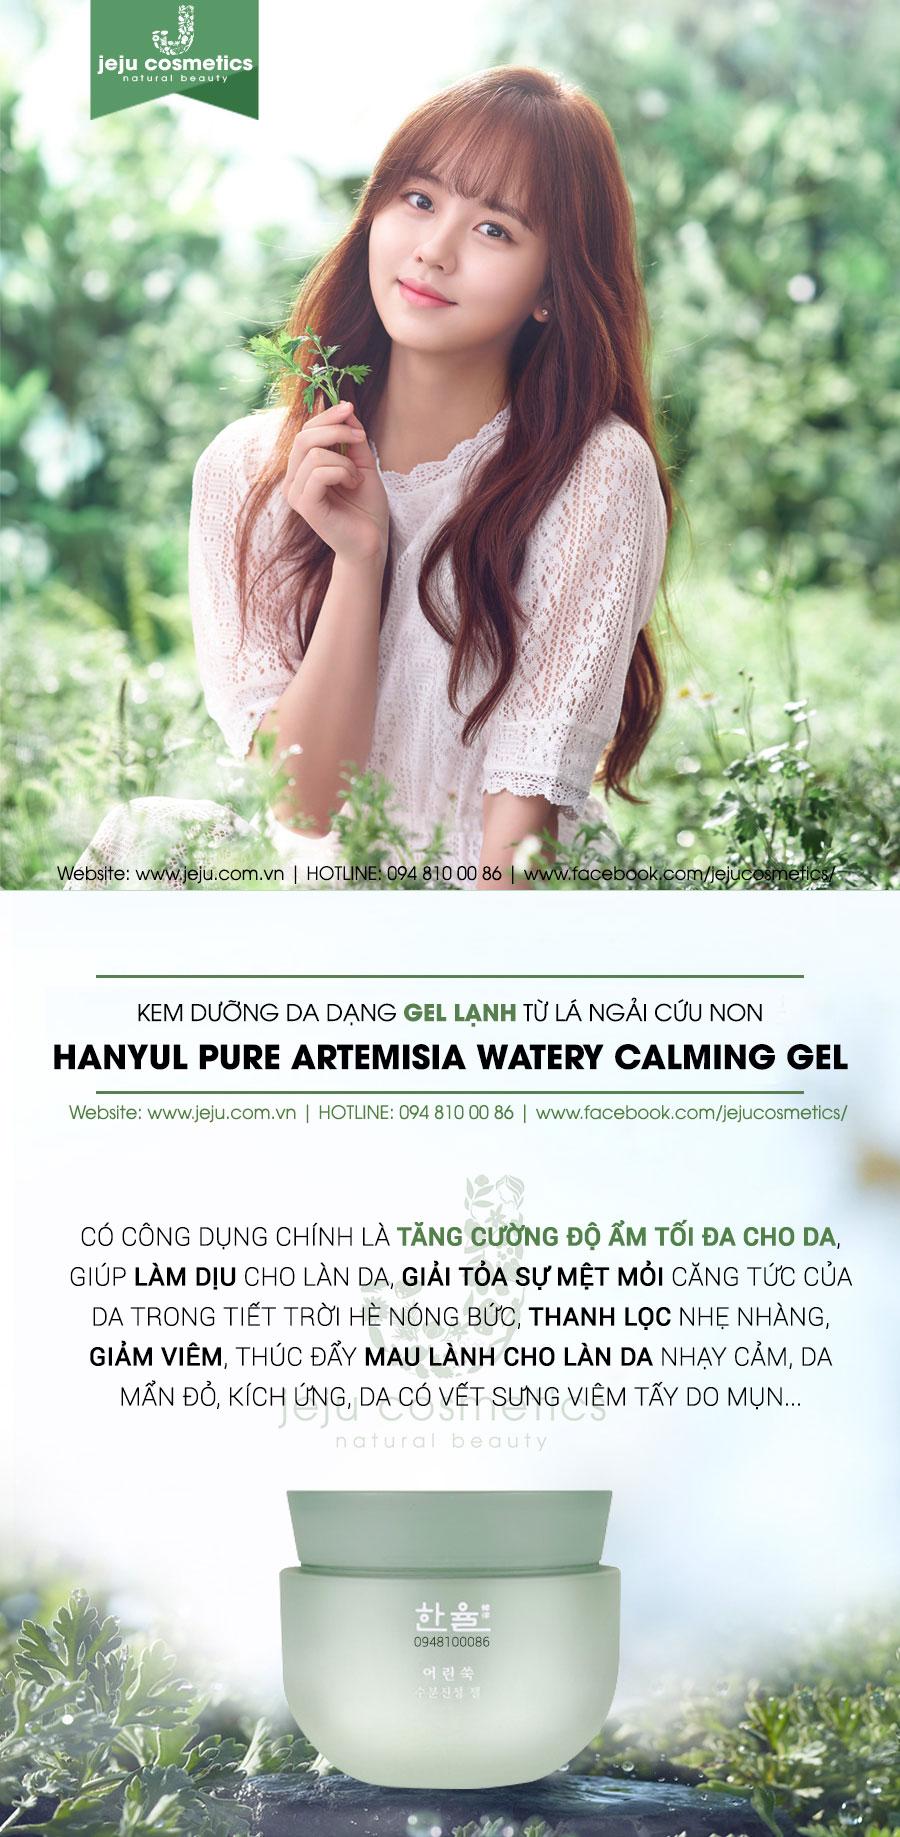 Hanyul Pure Artemisia Watery Calming Gel